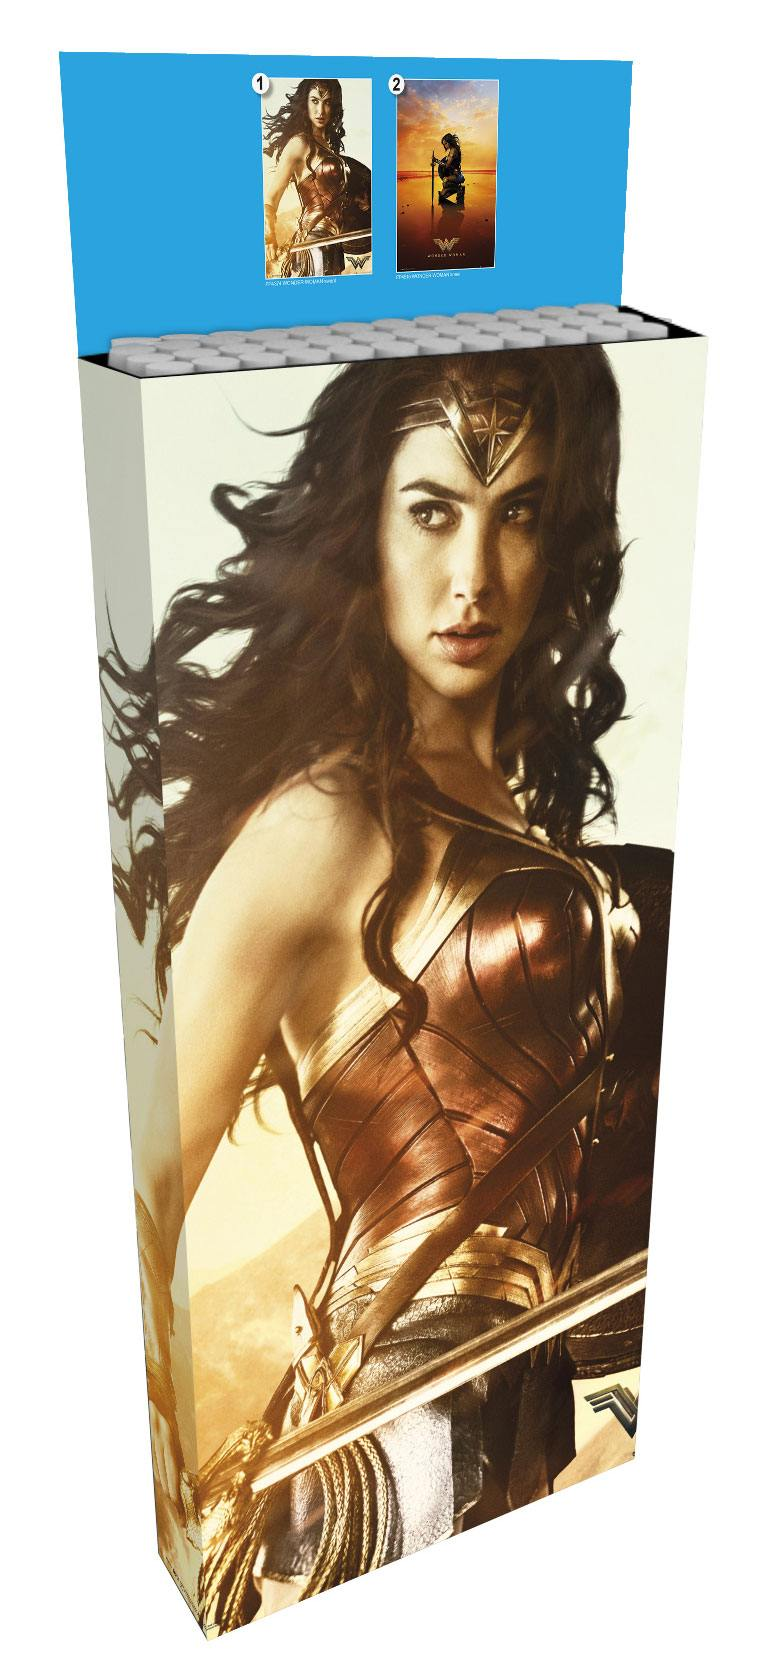 Wonder Woman Poster 61 x 91 cm Display (35)